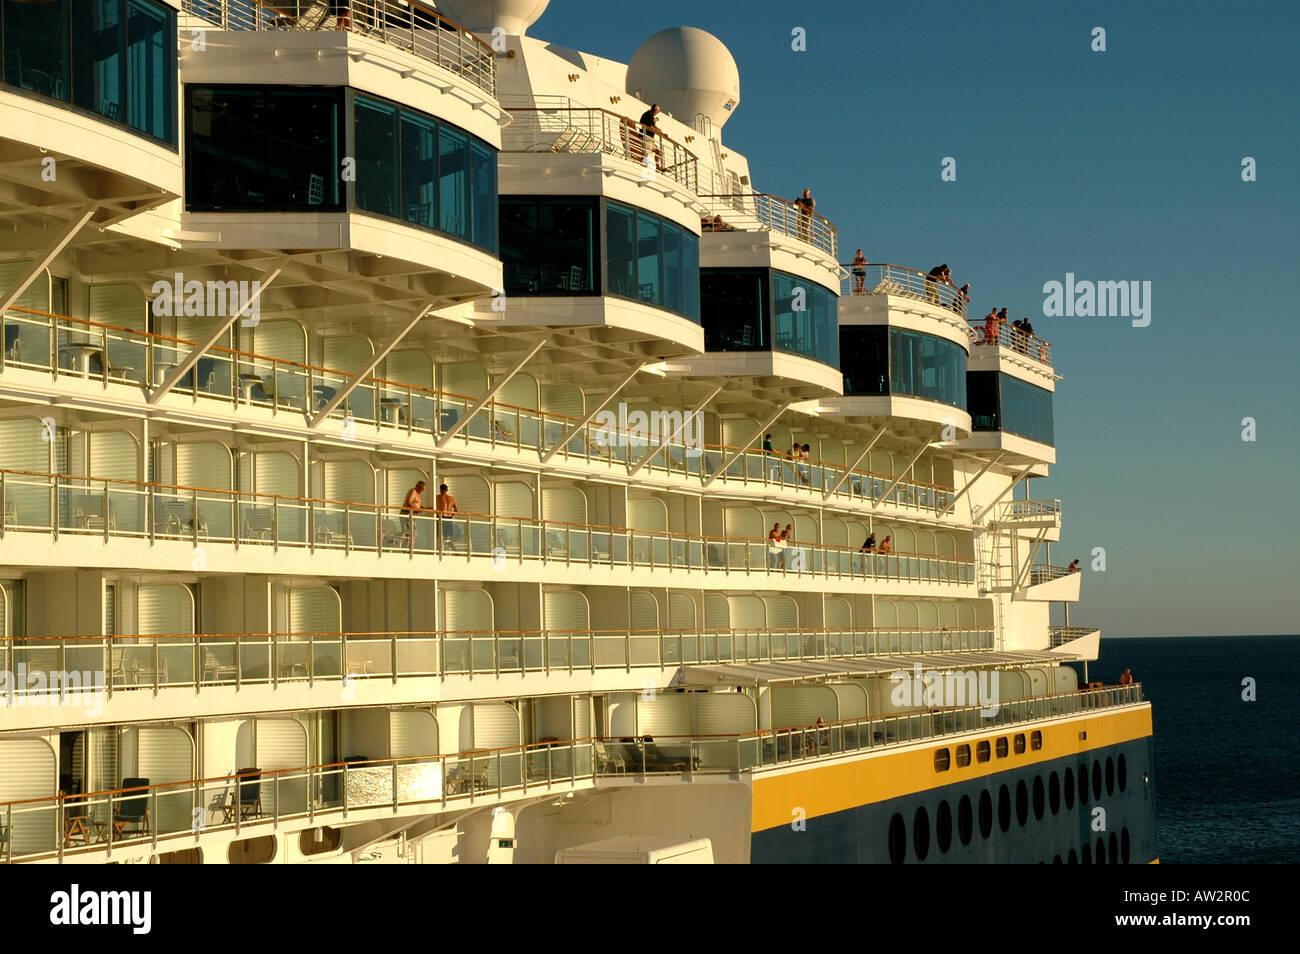 Celebrity infinity ship model